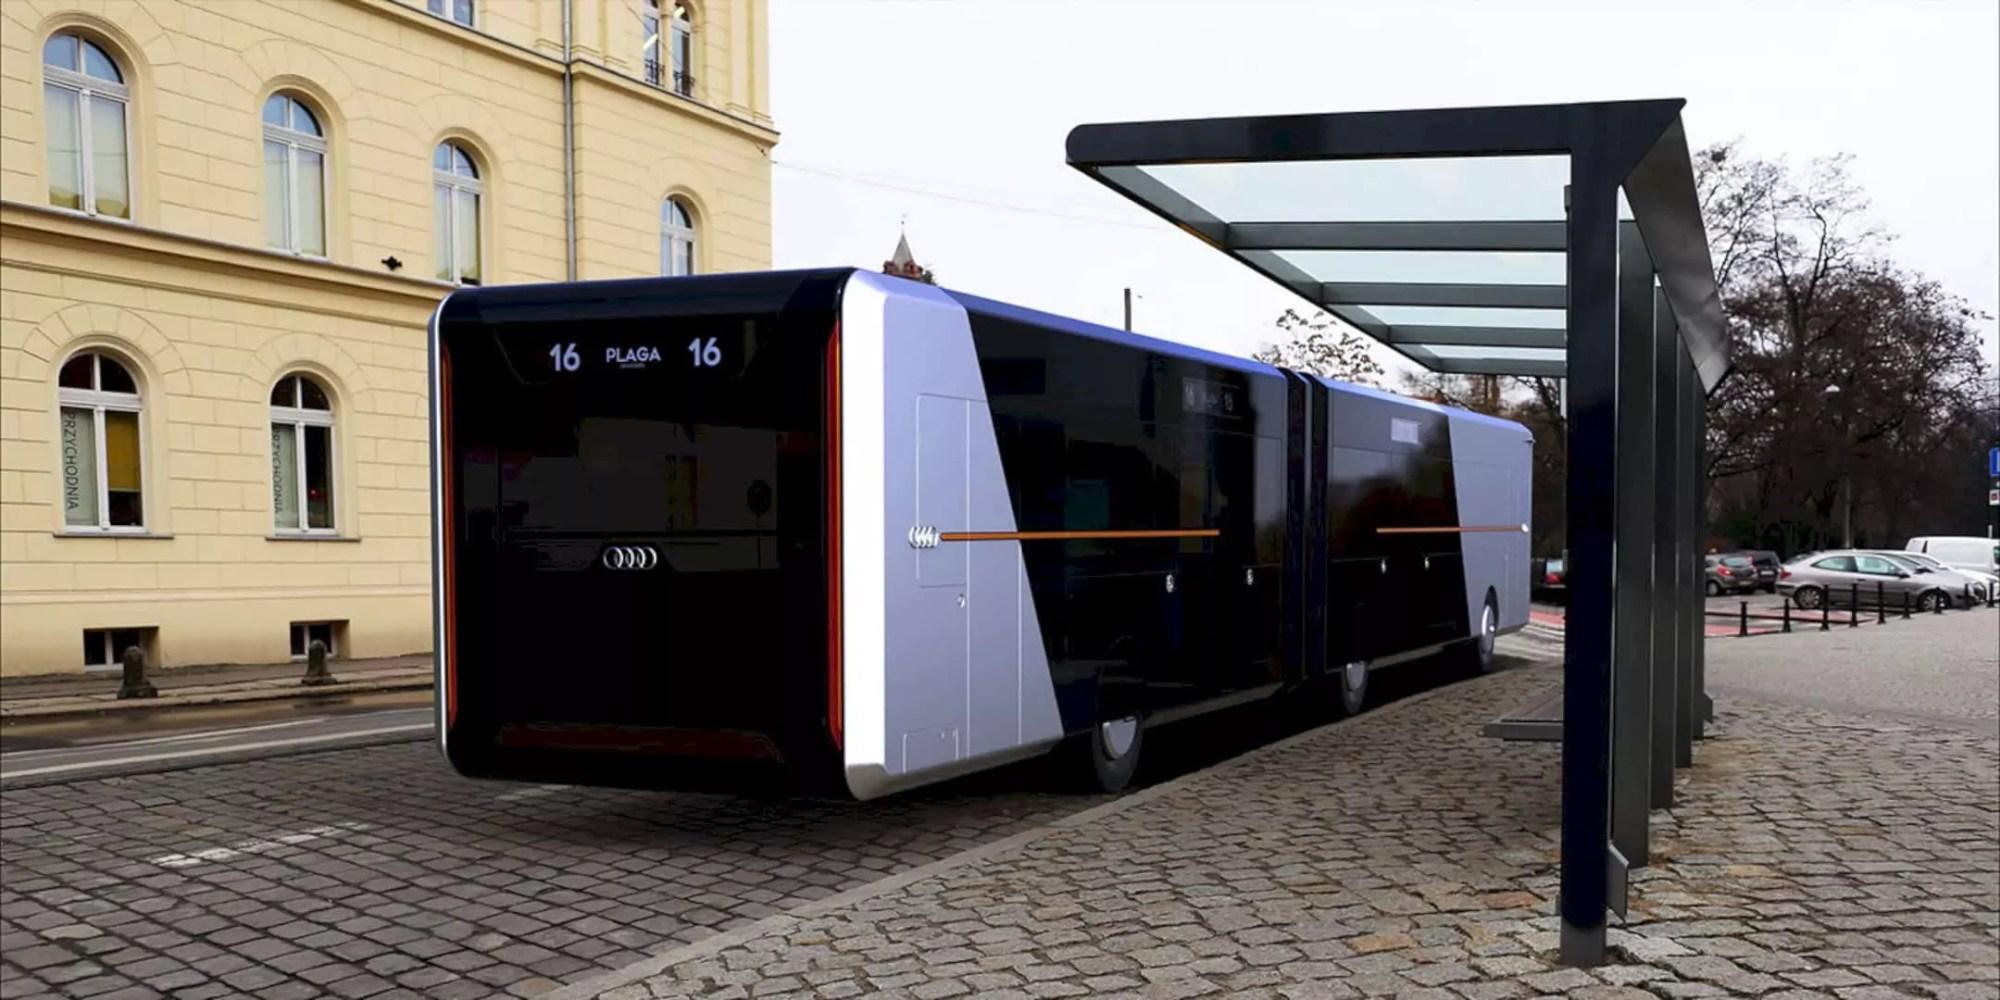 Audi City Bus: A Conceptual Design of A Futuristic Bus